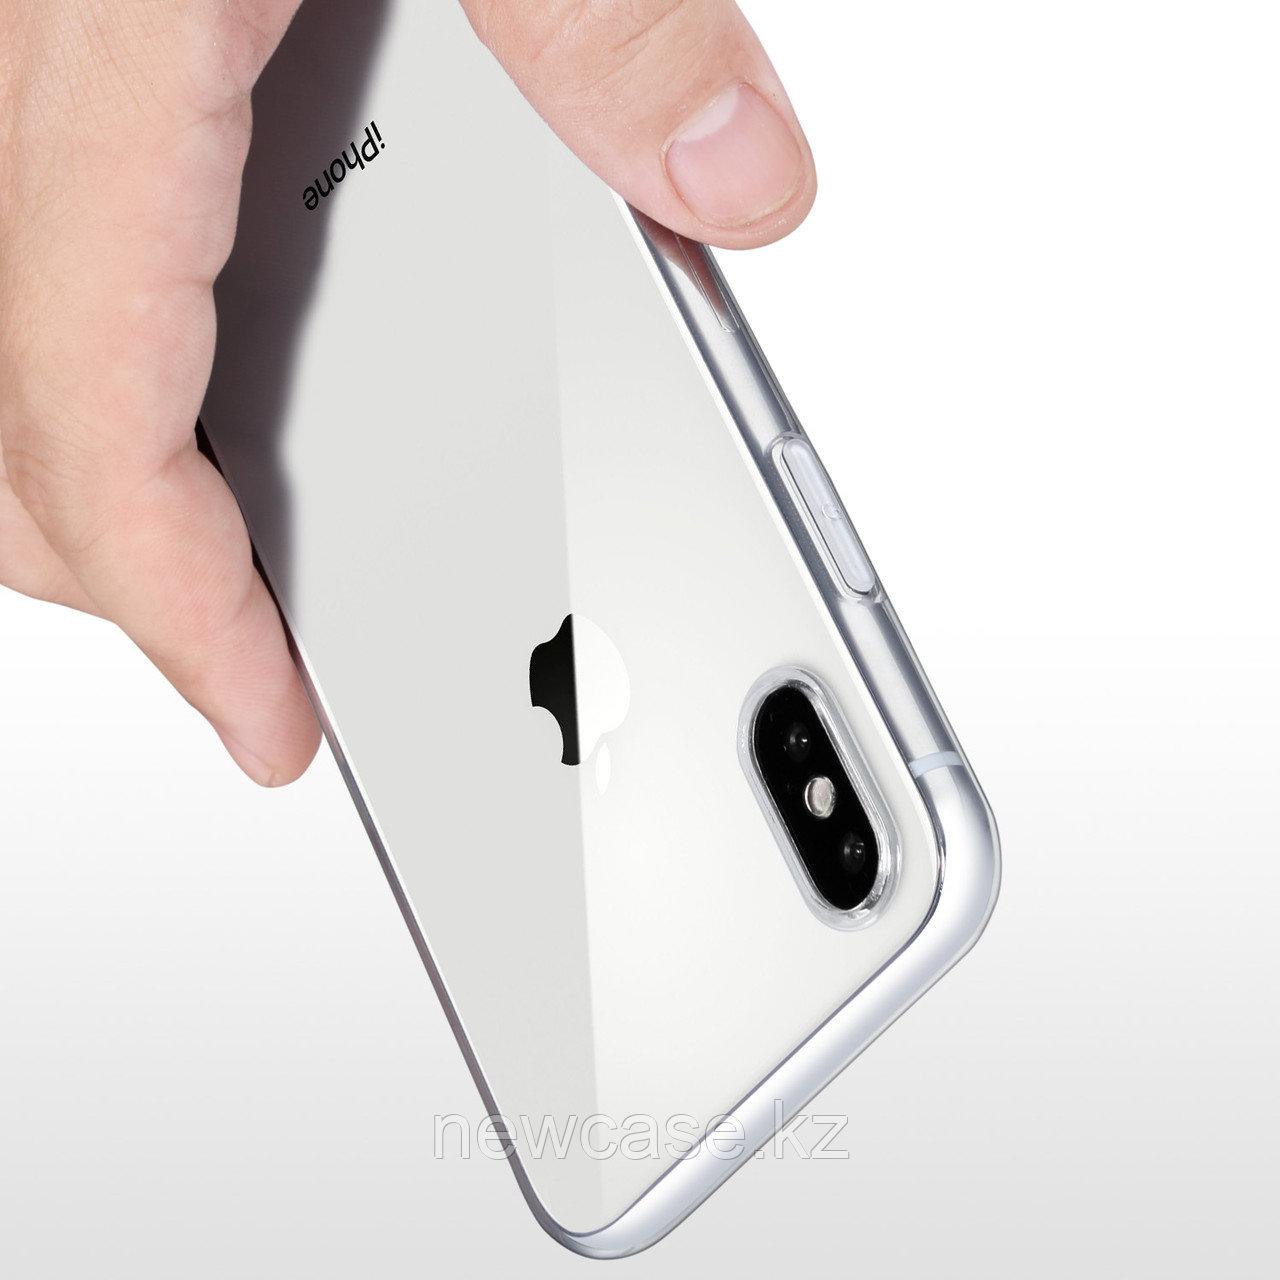 Силиконовый прозрачный чехол для iPhone 5/6/7/8/X/XR/XS Max/11/11 Pro/11 Pro Max - фото 3